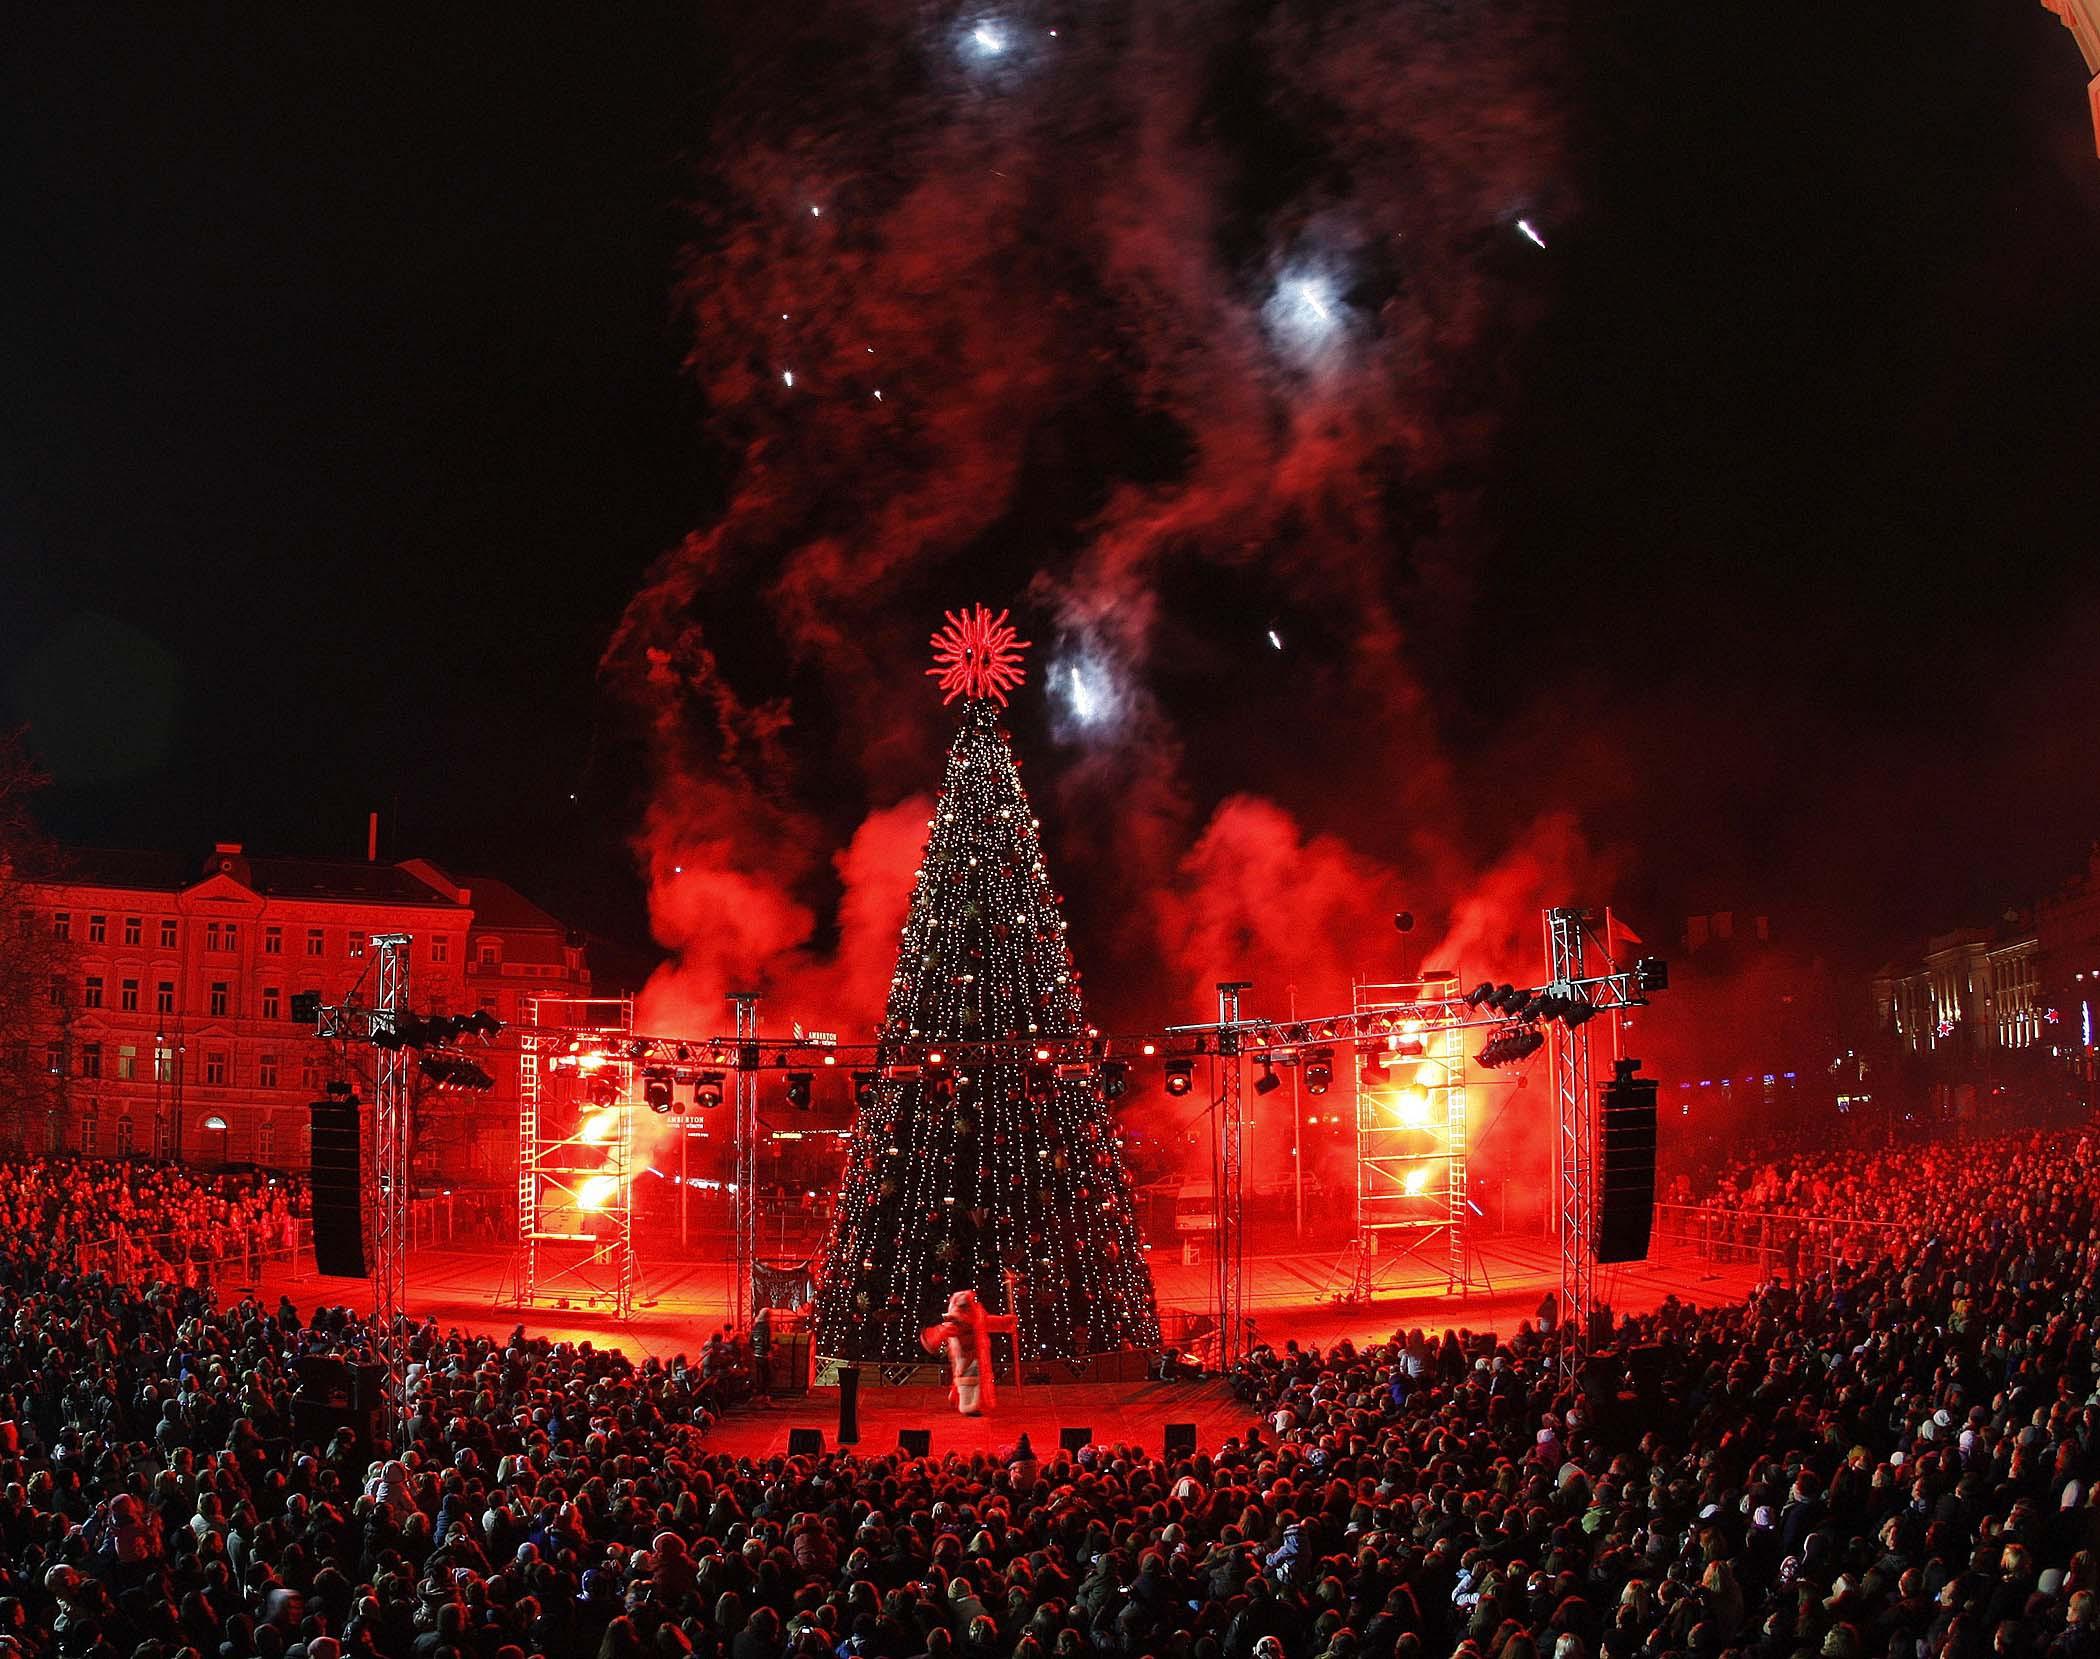 Lighting Of The Christmas Tree In Vilnius 2014 Wallpapers